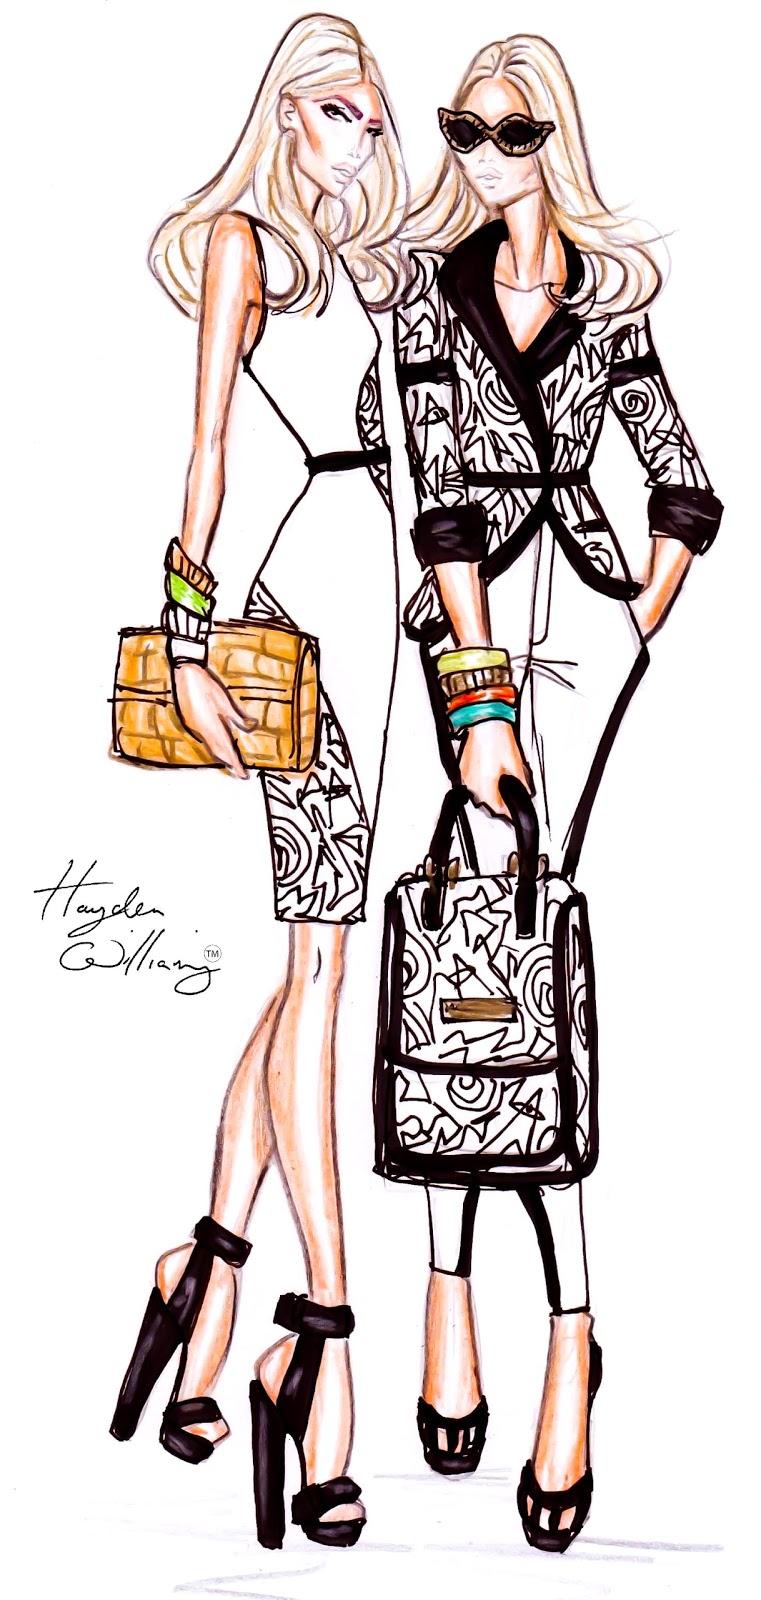 Fashion Illustration Royalty Free Stock Photo: Hayden Williams Fashion Illustrations: September 2011